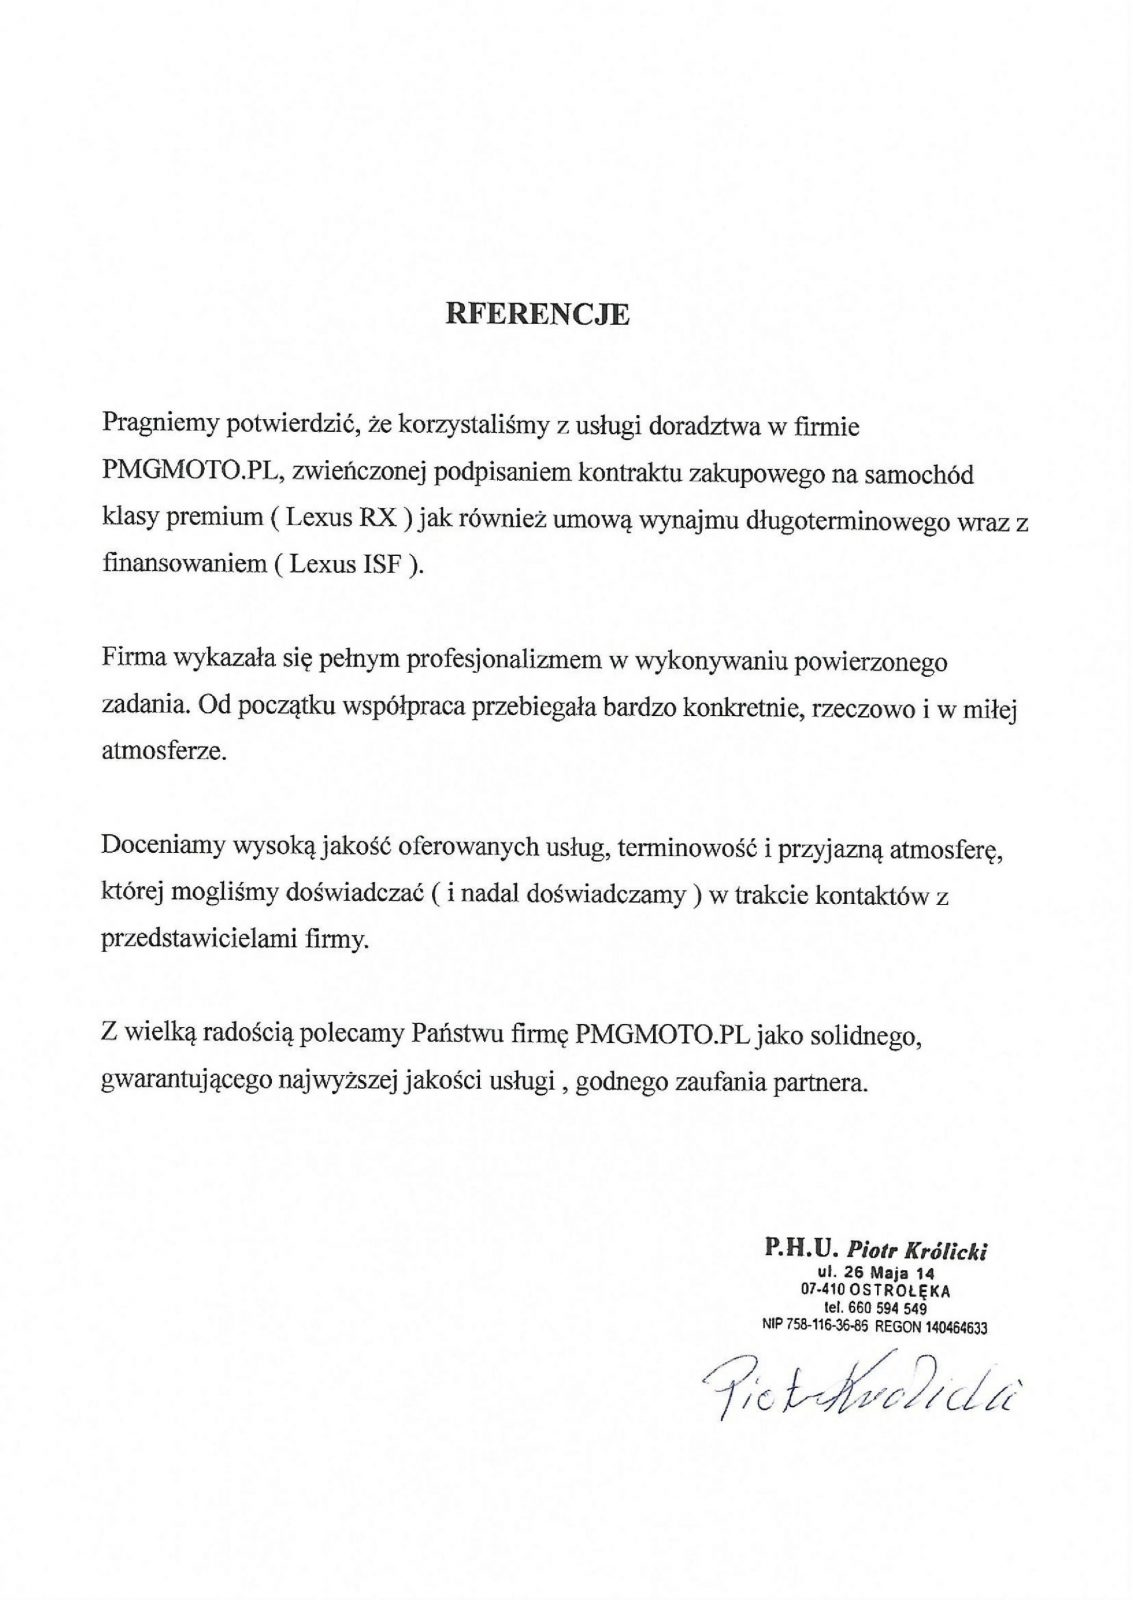 P.U.H. Piotr Królicki